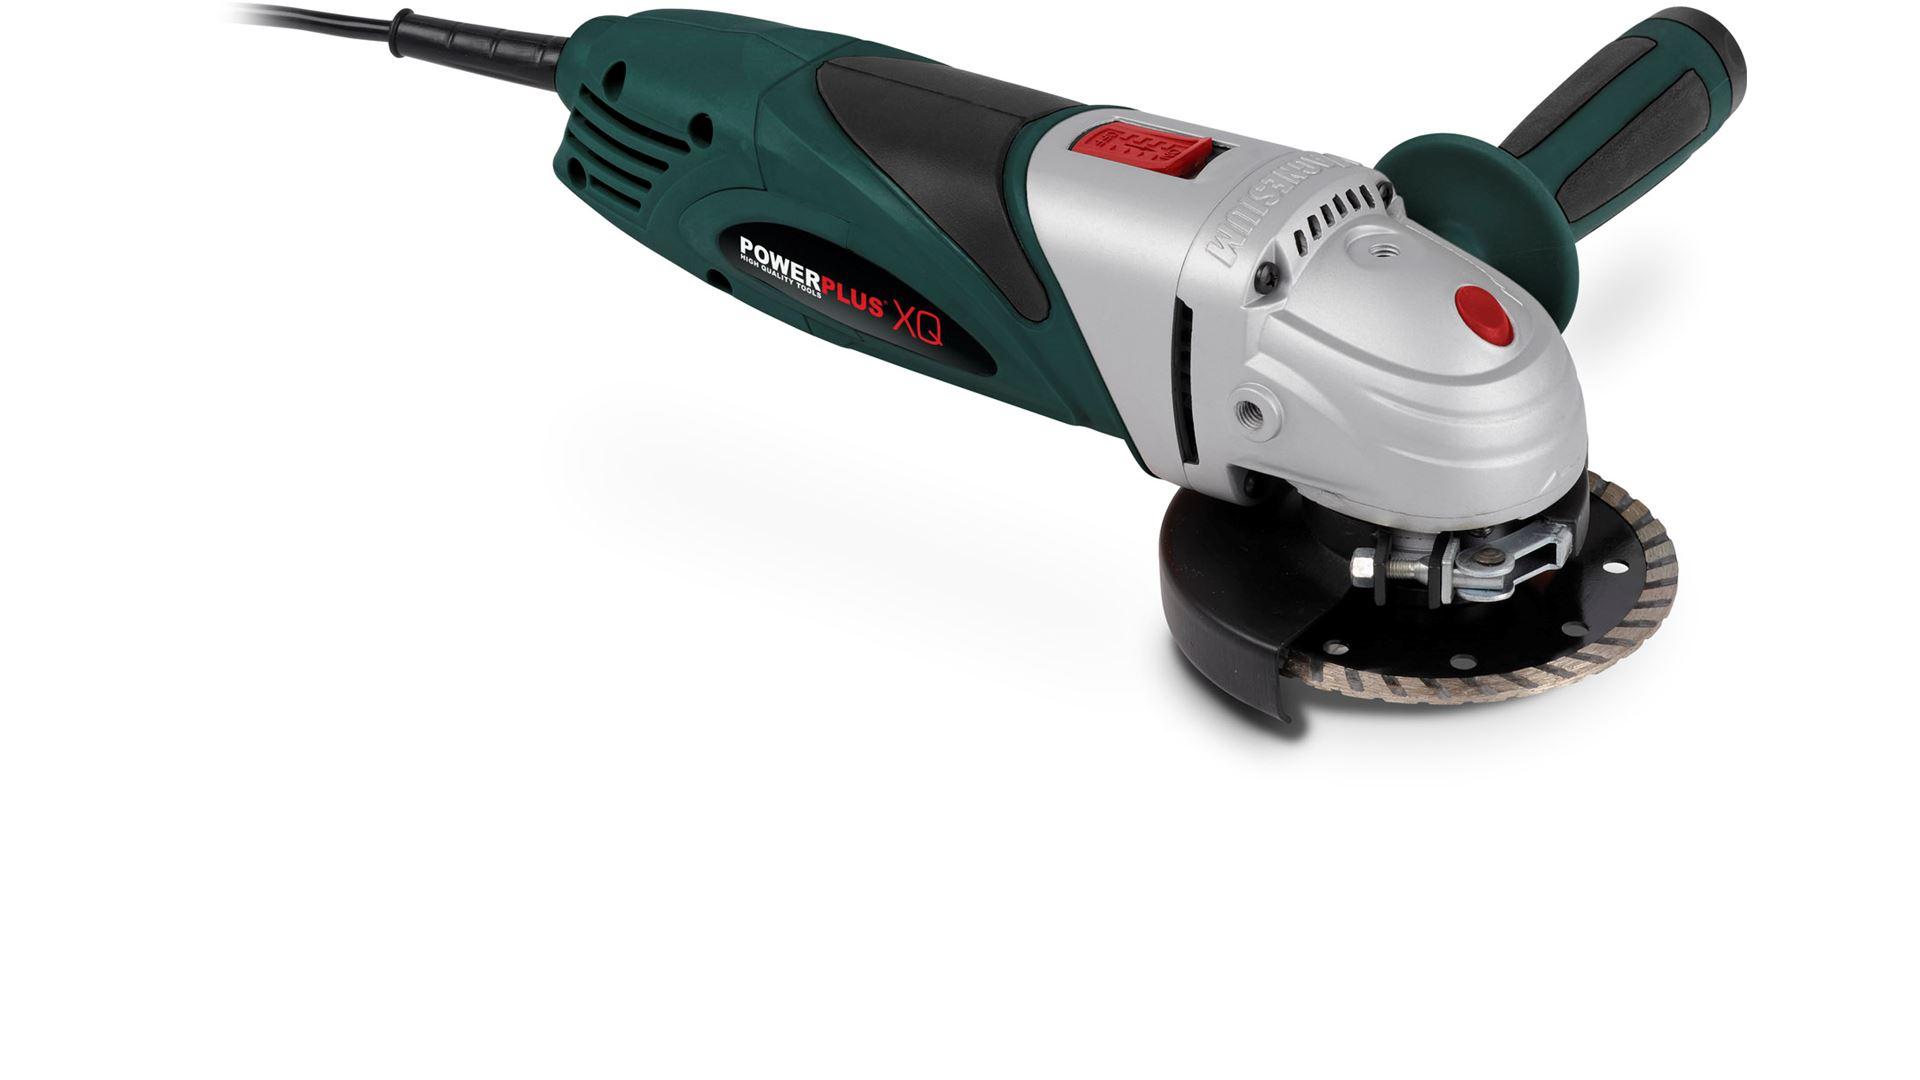 POWXQ5102 Haakse Slijper 950W Ø115mm